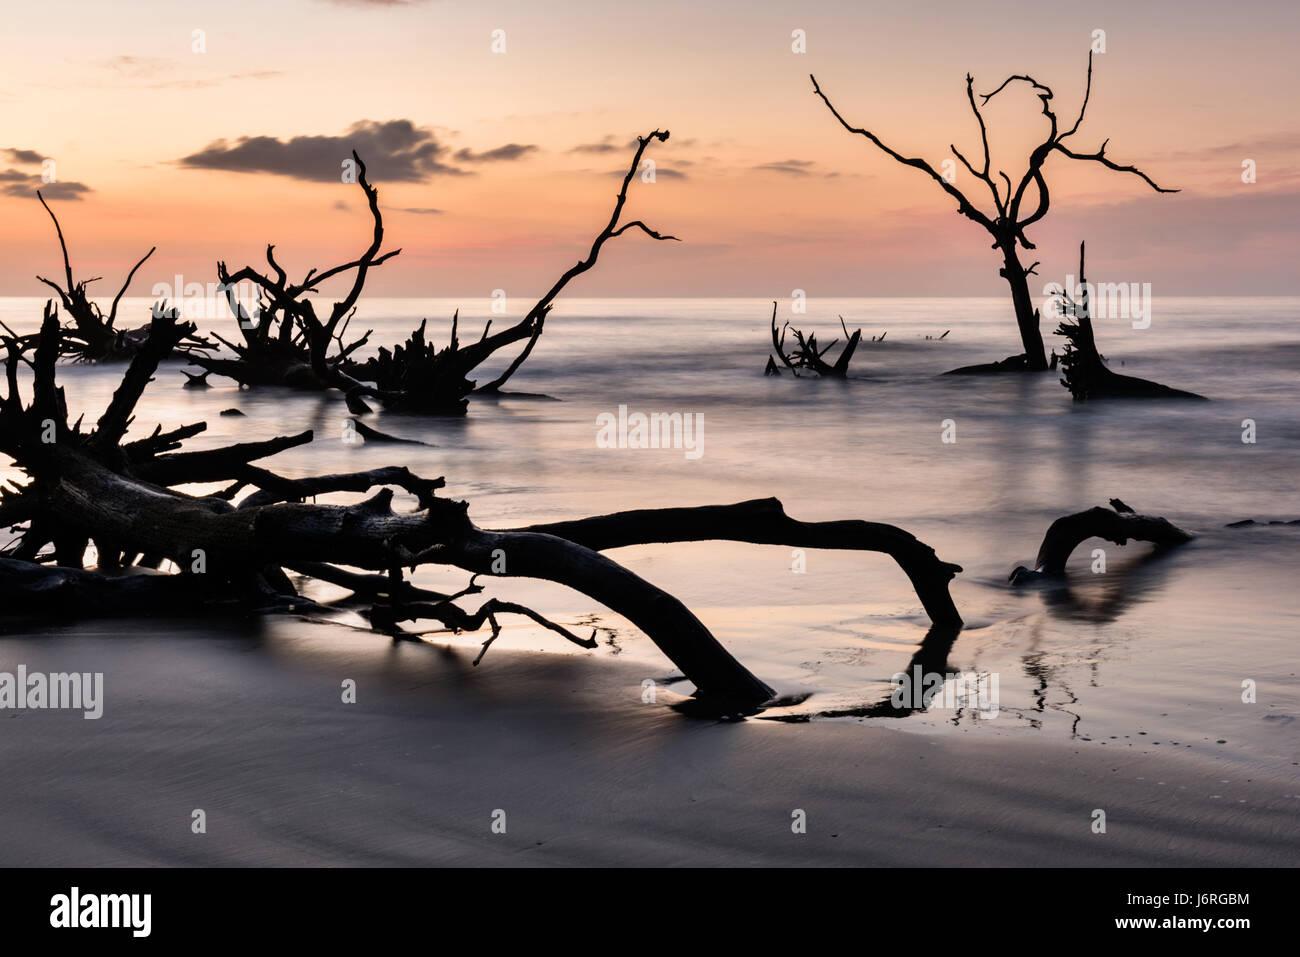 Sunrise over the Boneyard Beach on Bulls Island, South Carolina. Bulls Island is an uninhabited Sea Island 3 miles - Stock Image